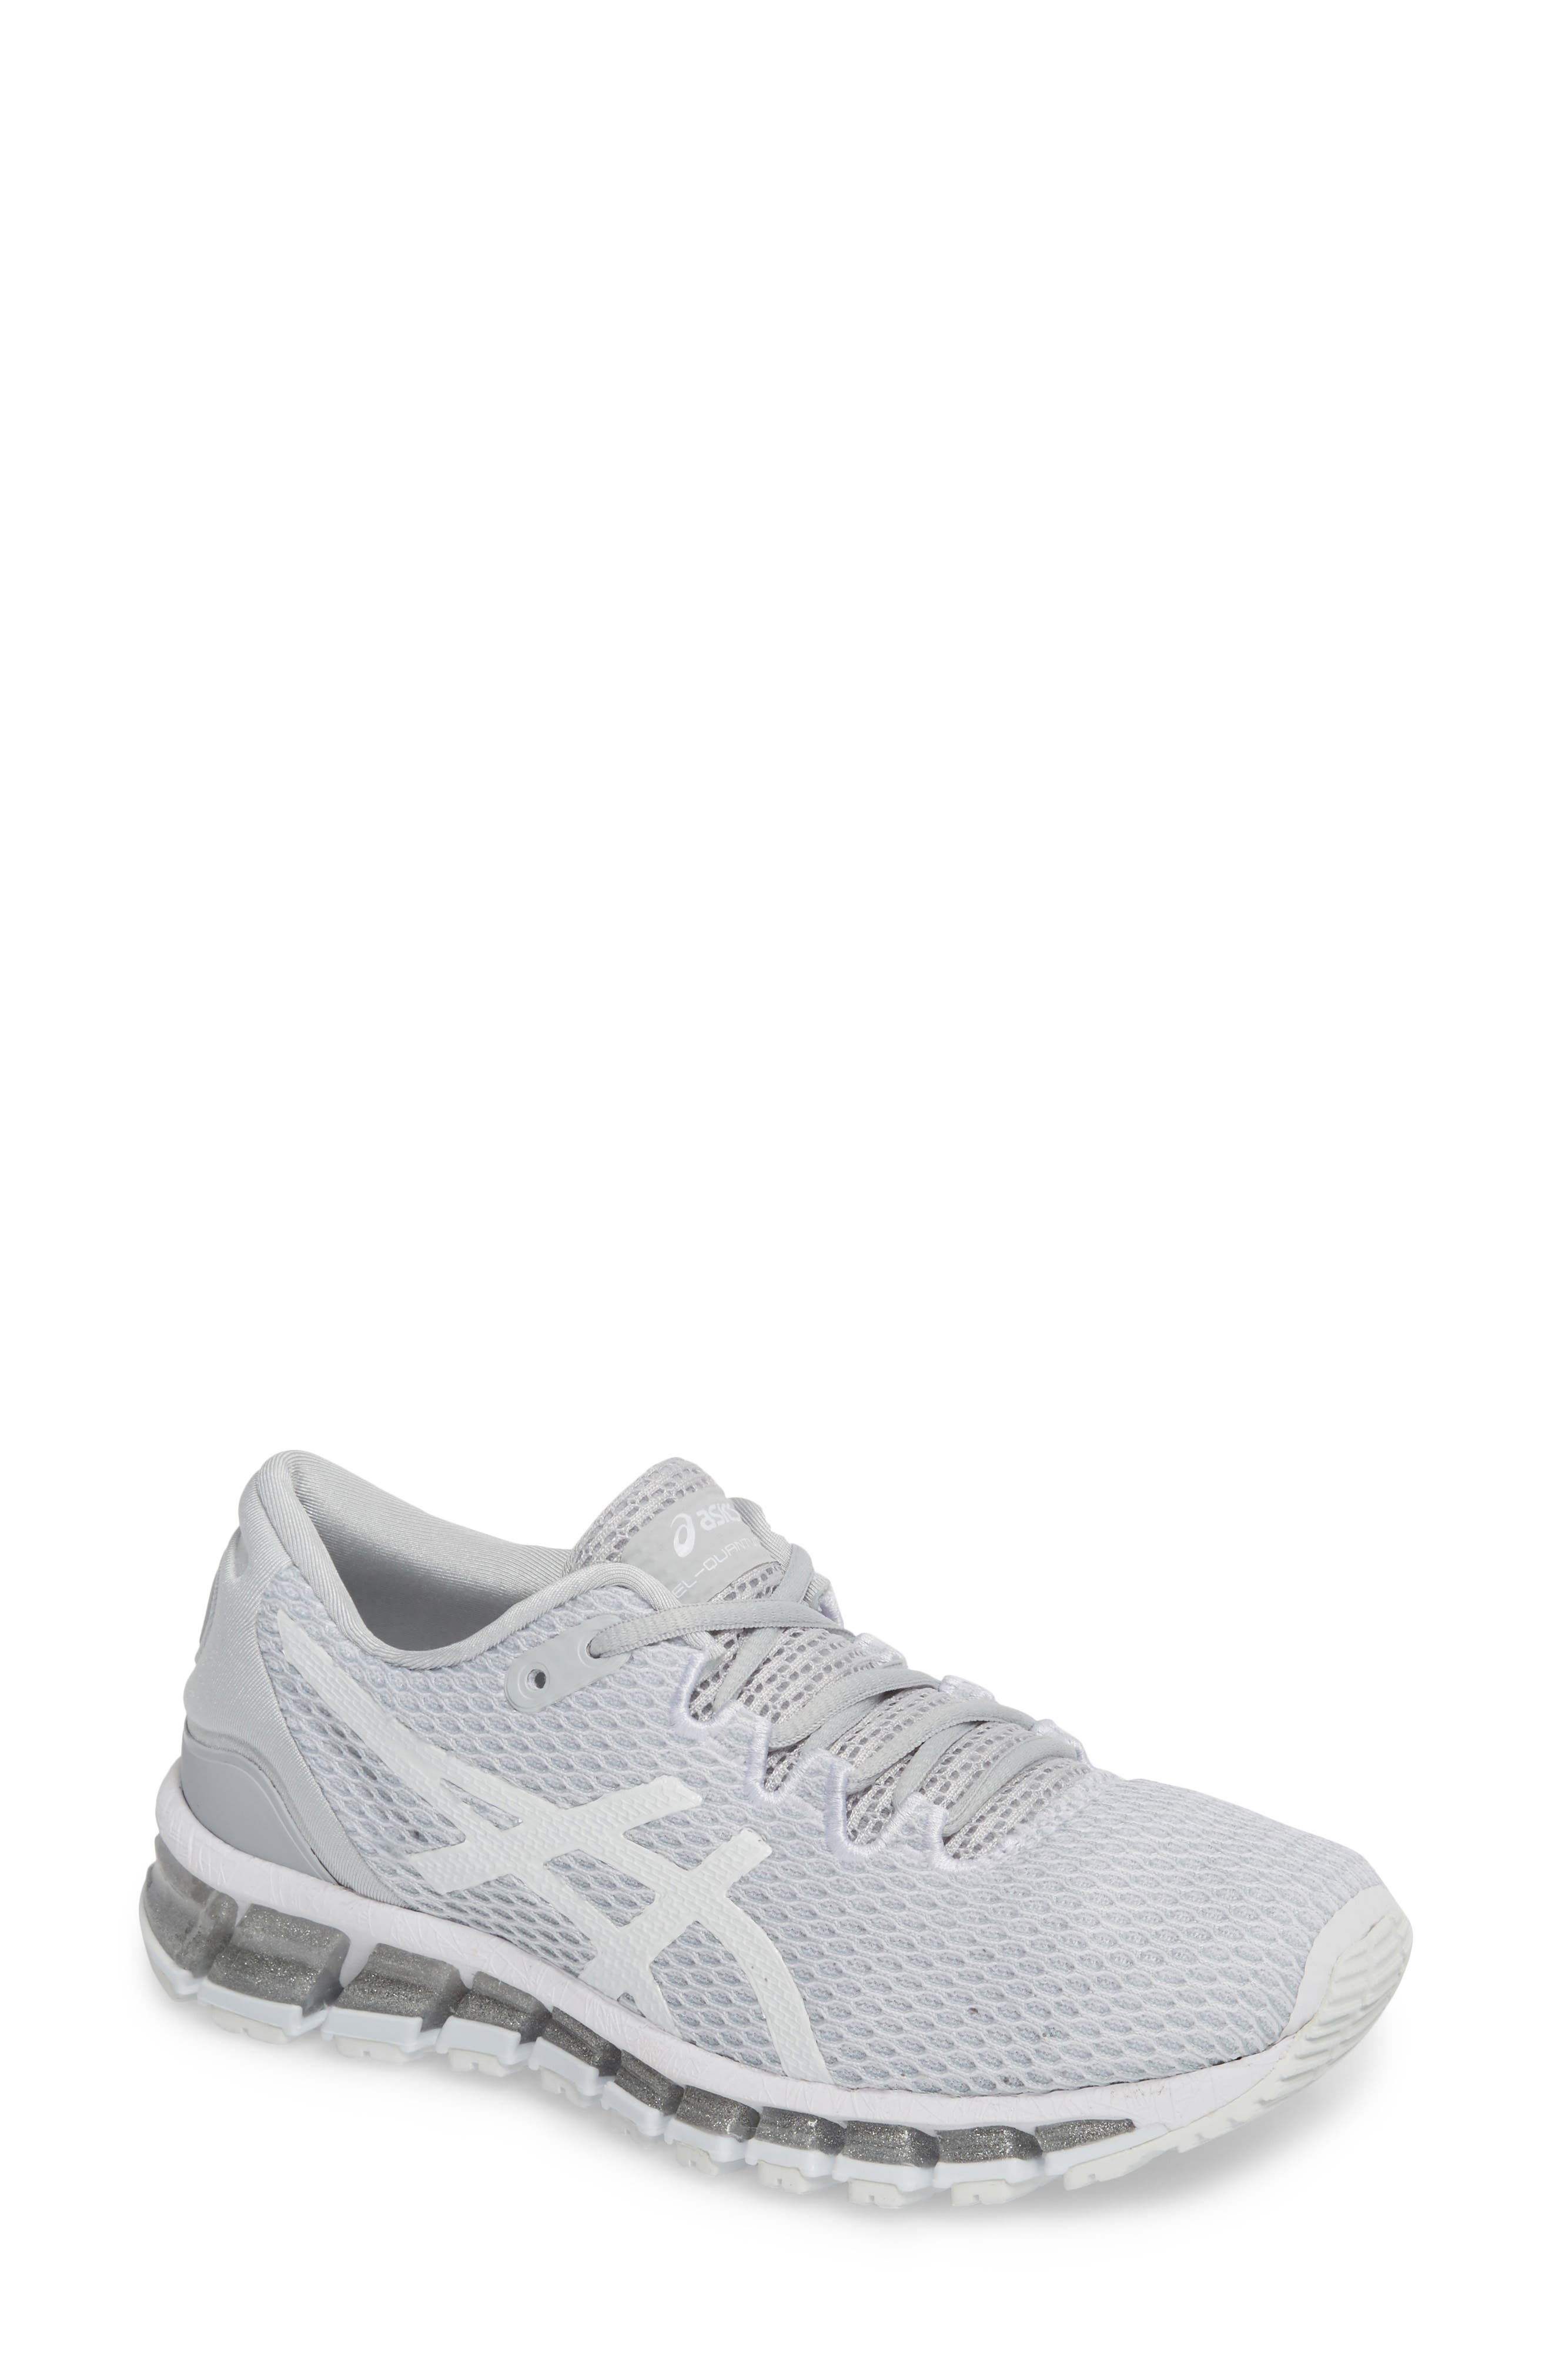 Asics Gel-Quantum 360 Shift Mx Running Shoe, White